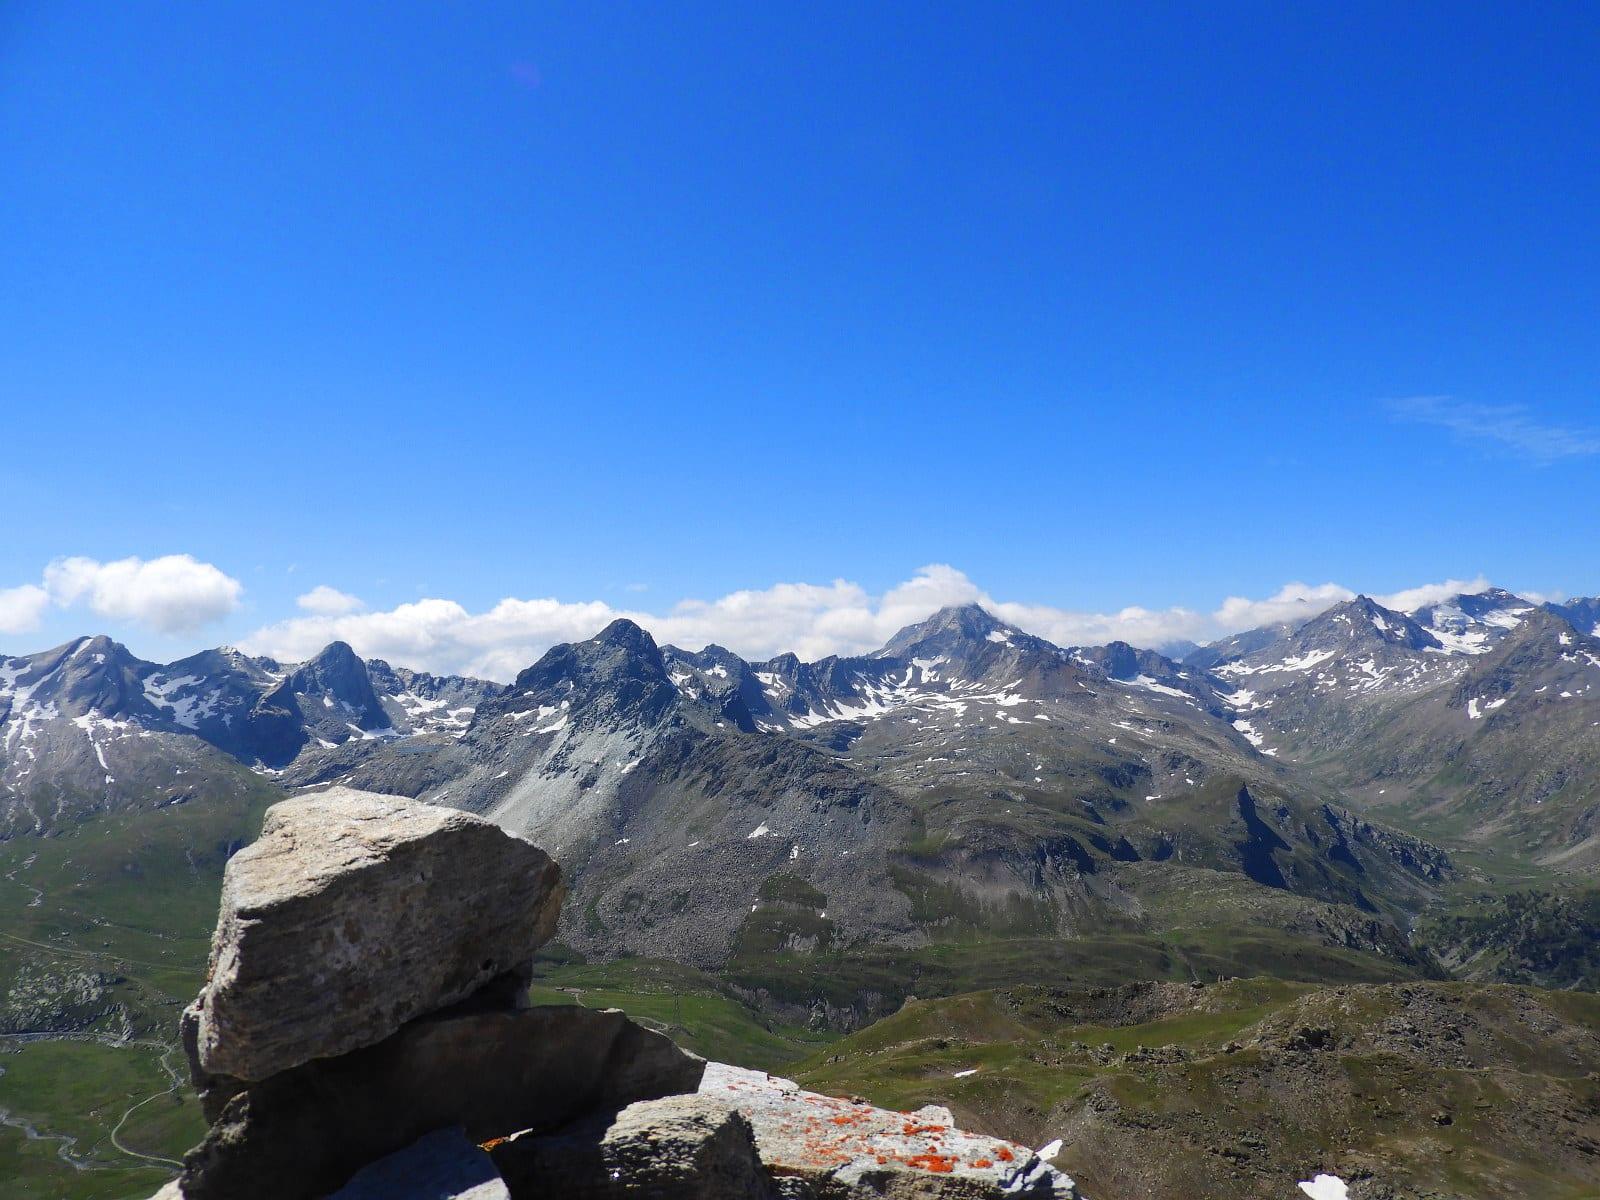 Gipfel Erlebnisse rund ums Aosta Tag